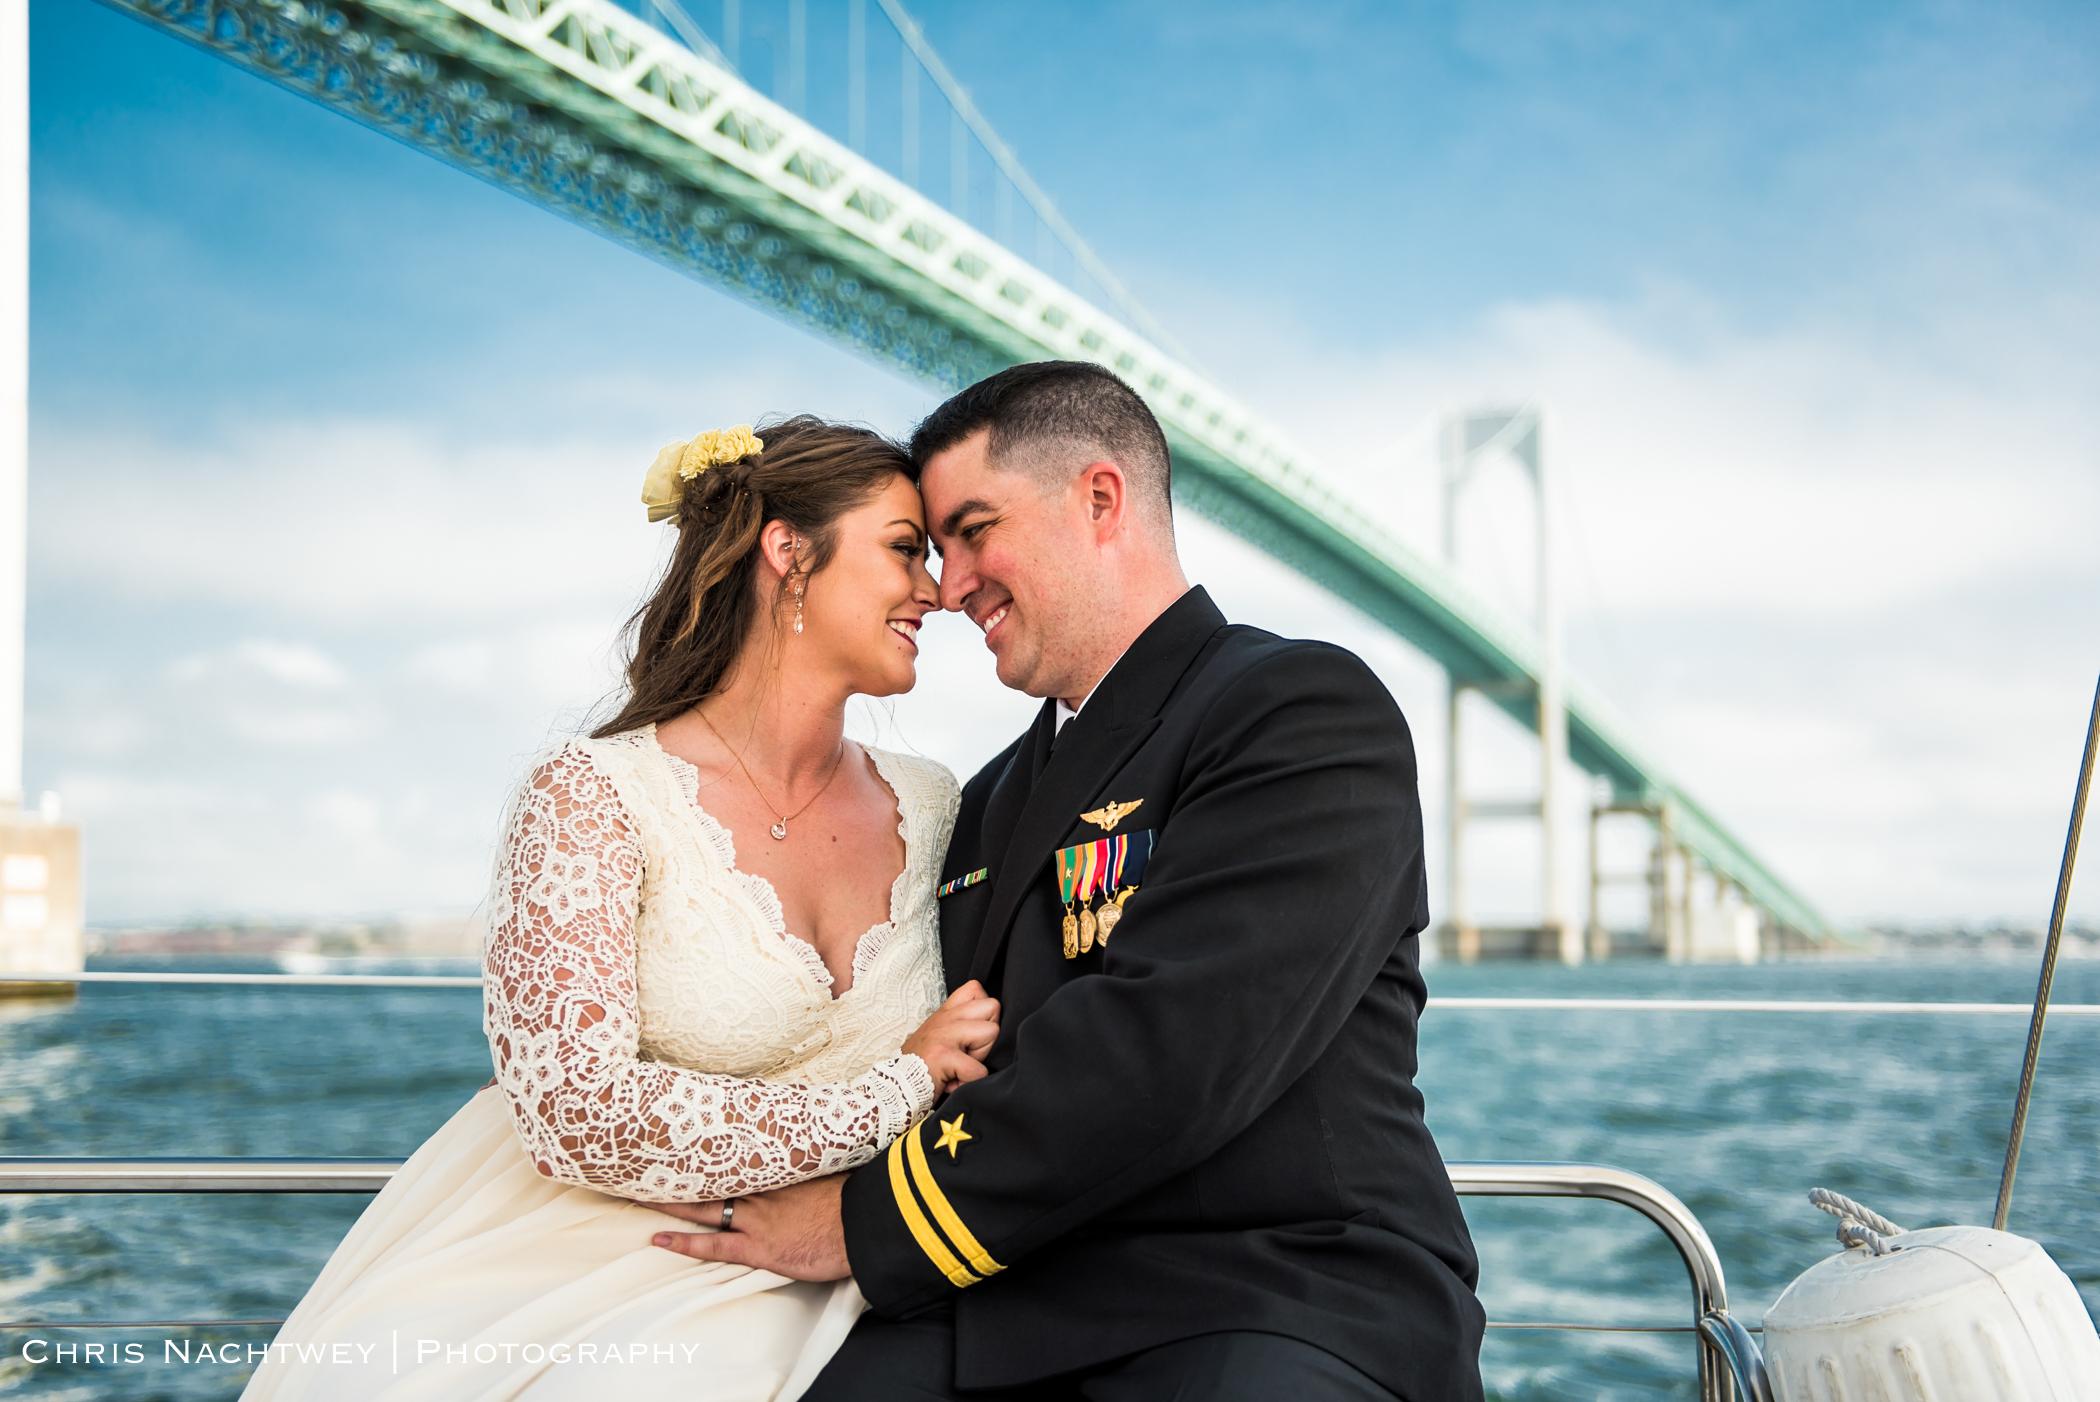 artistic-ct-wedding-photographers-chris-nachtwey-2017-24.jpg